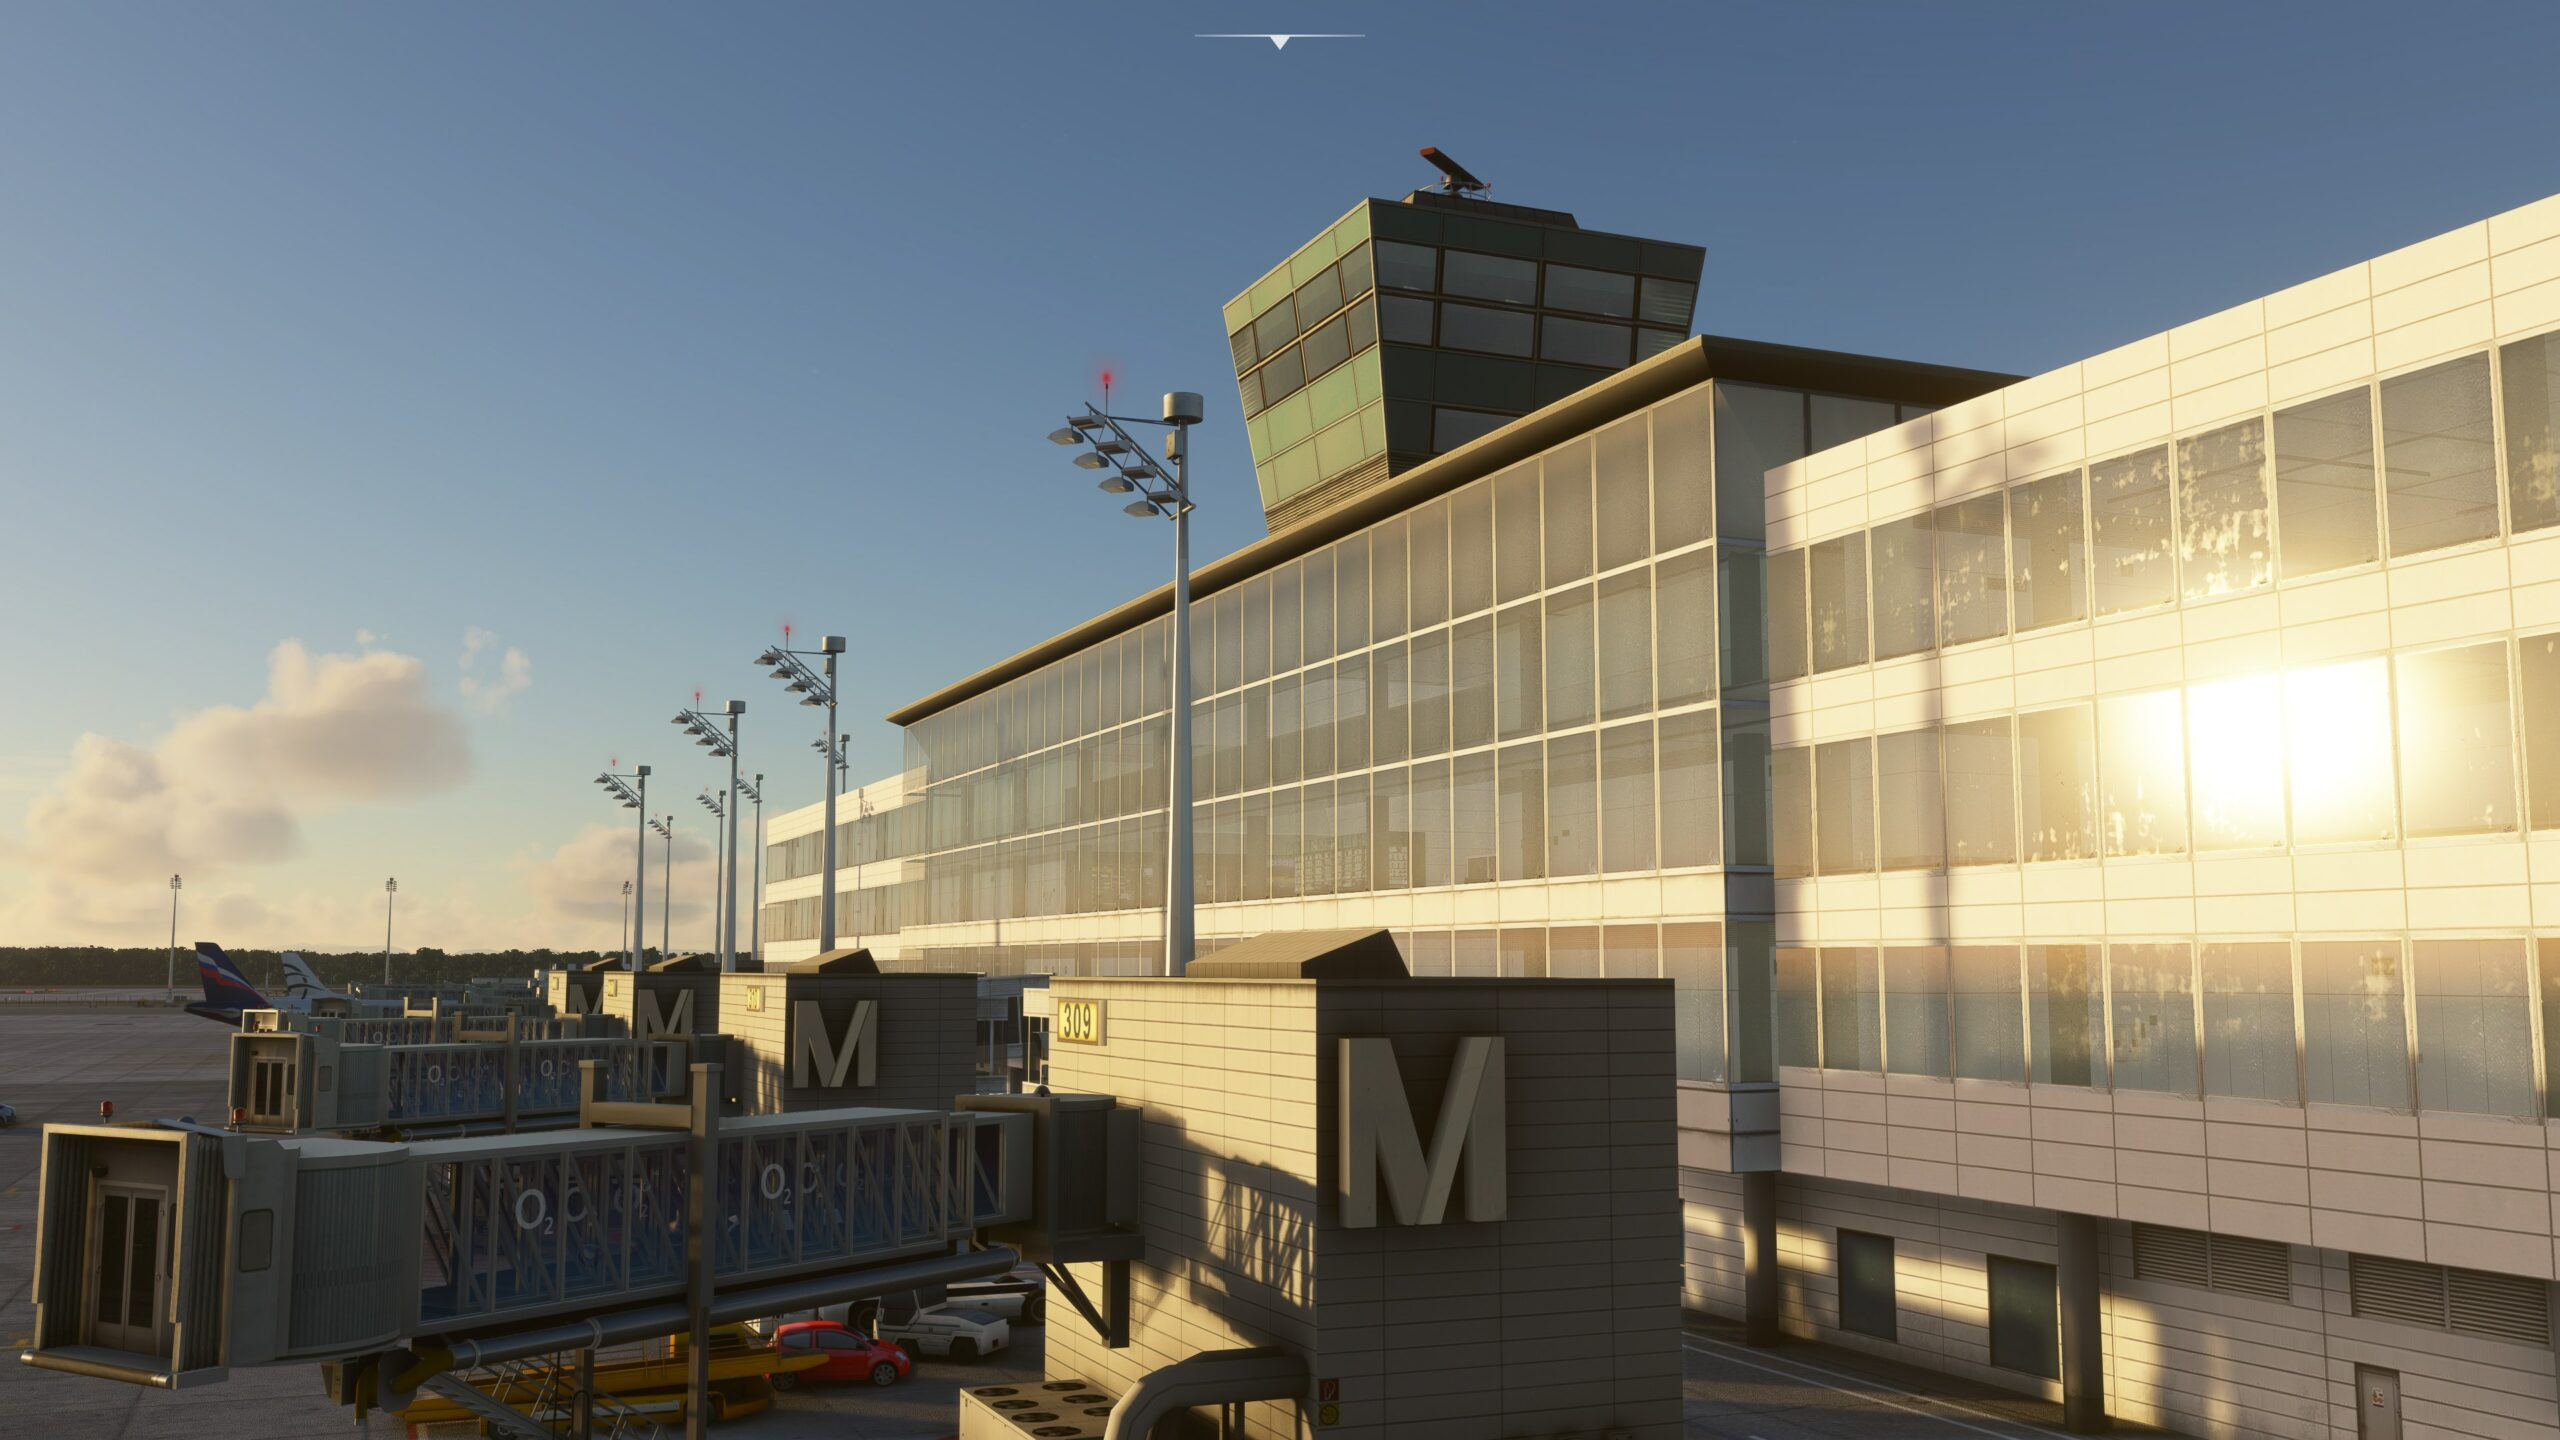 FlightSimulator_aKqILr9QgR